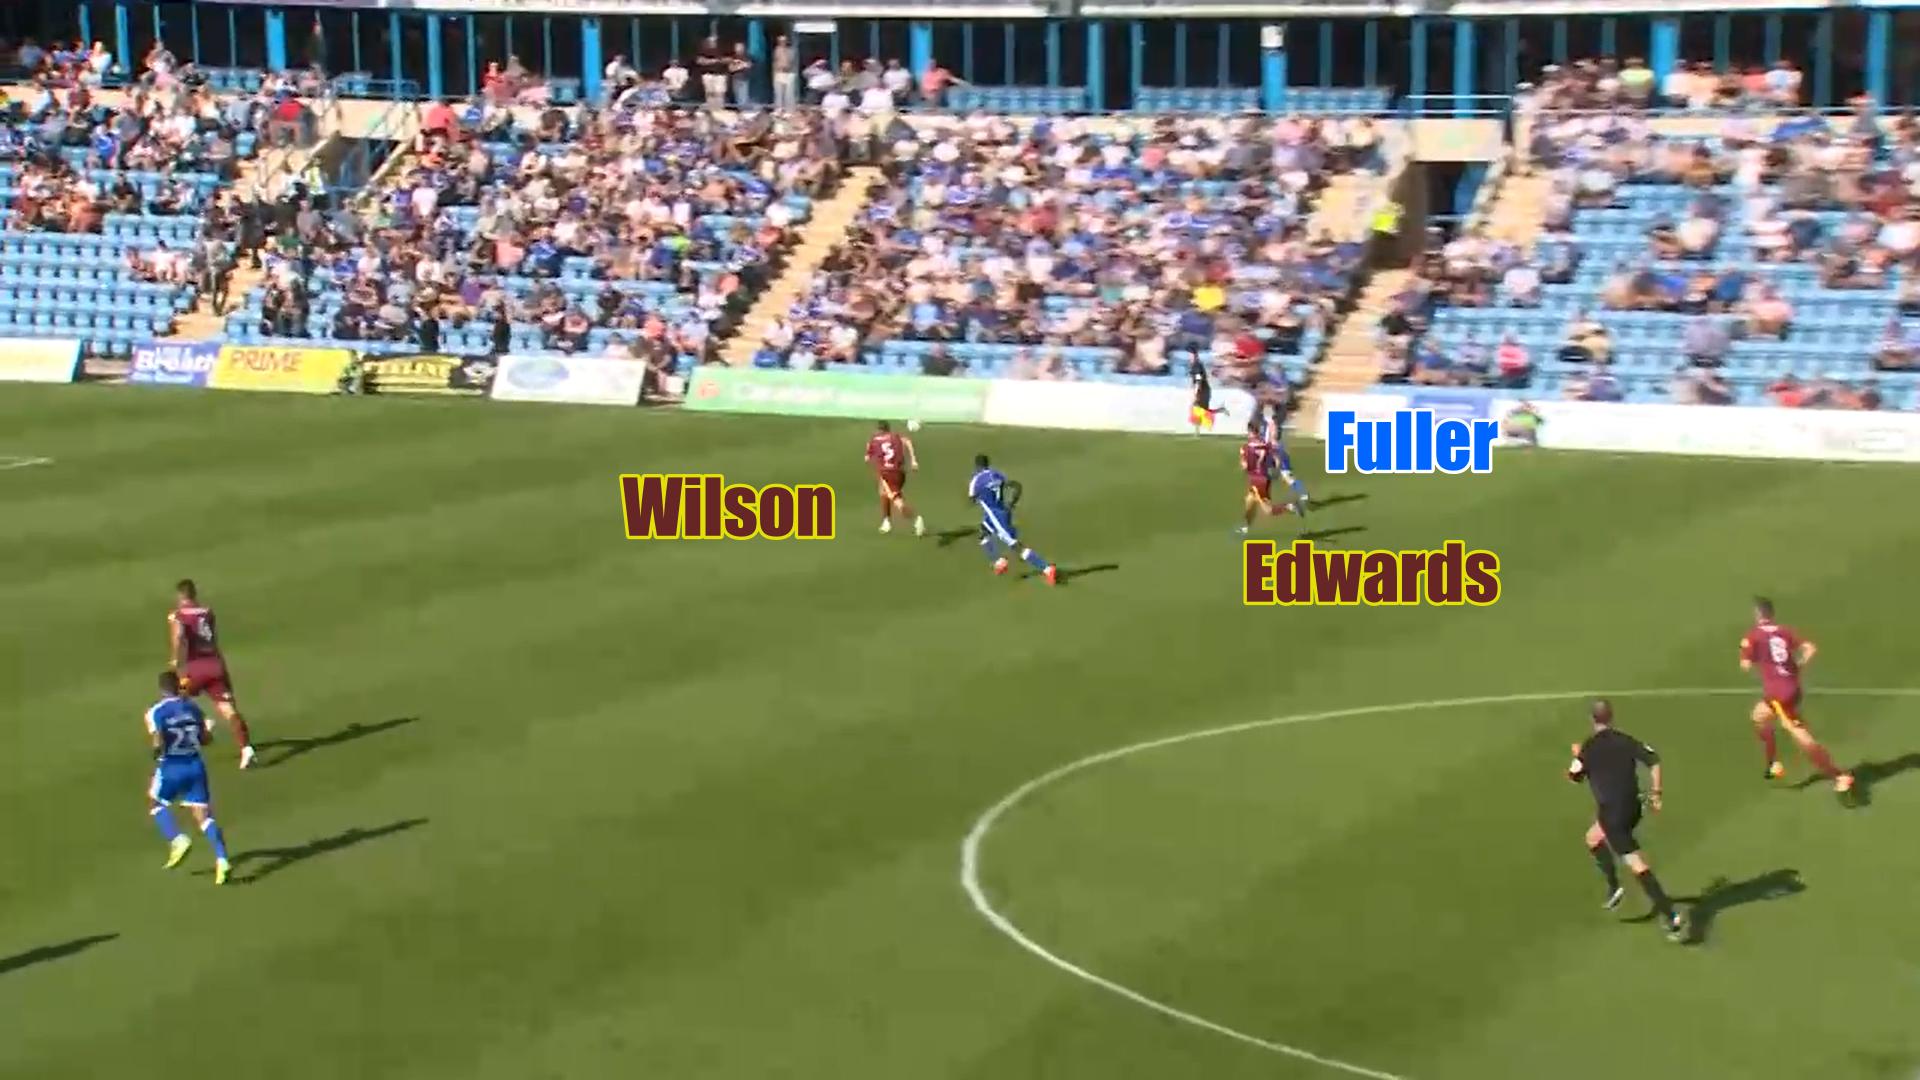 EFL League One 2019/20: Gillingham vs Ipswich Town - tactical analysis tactics